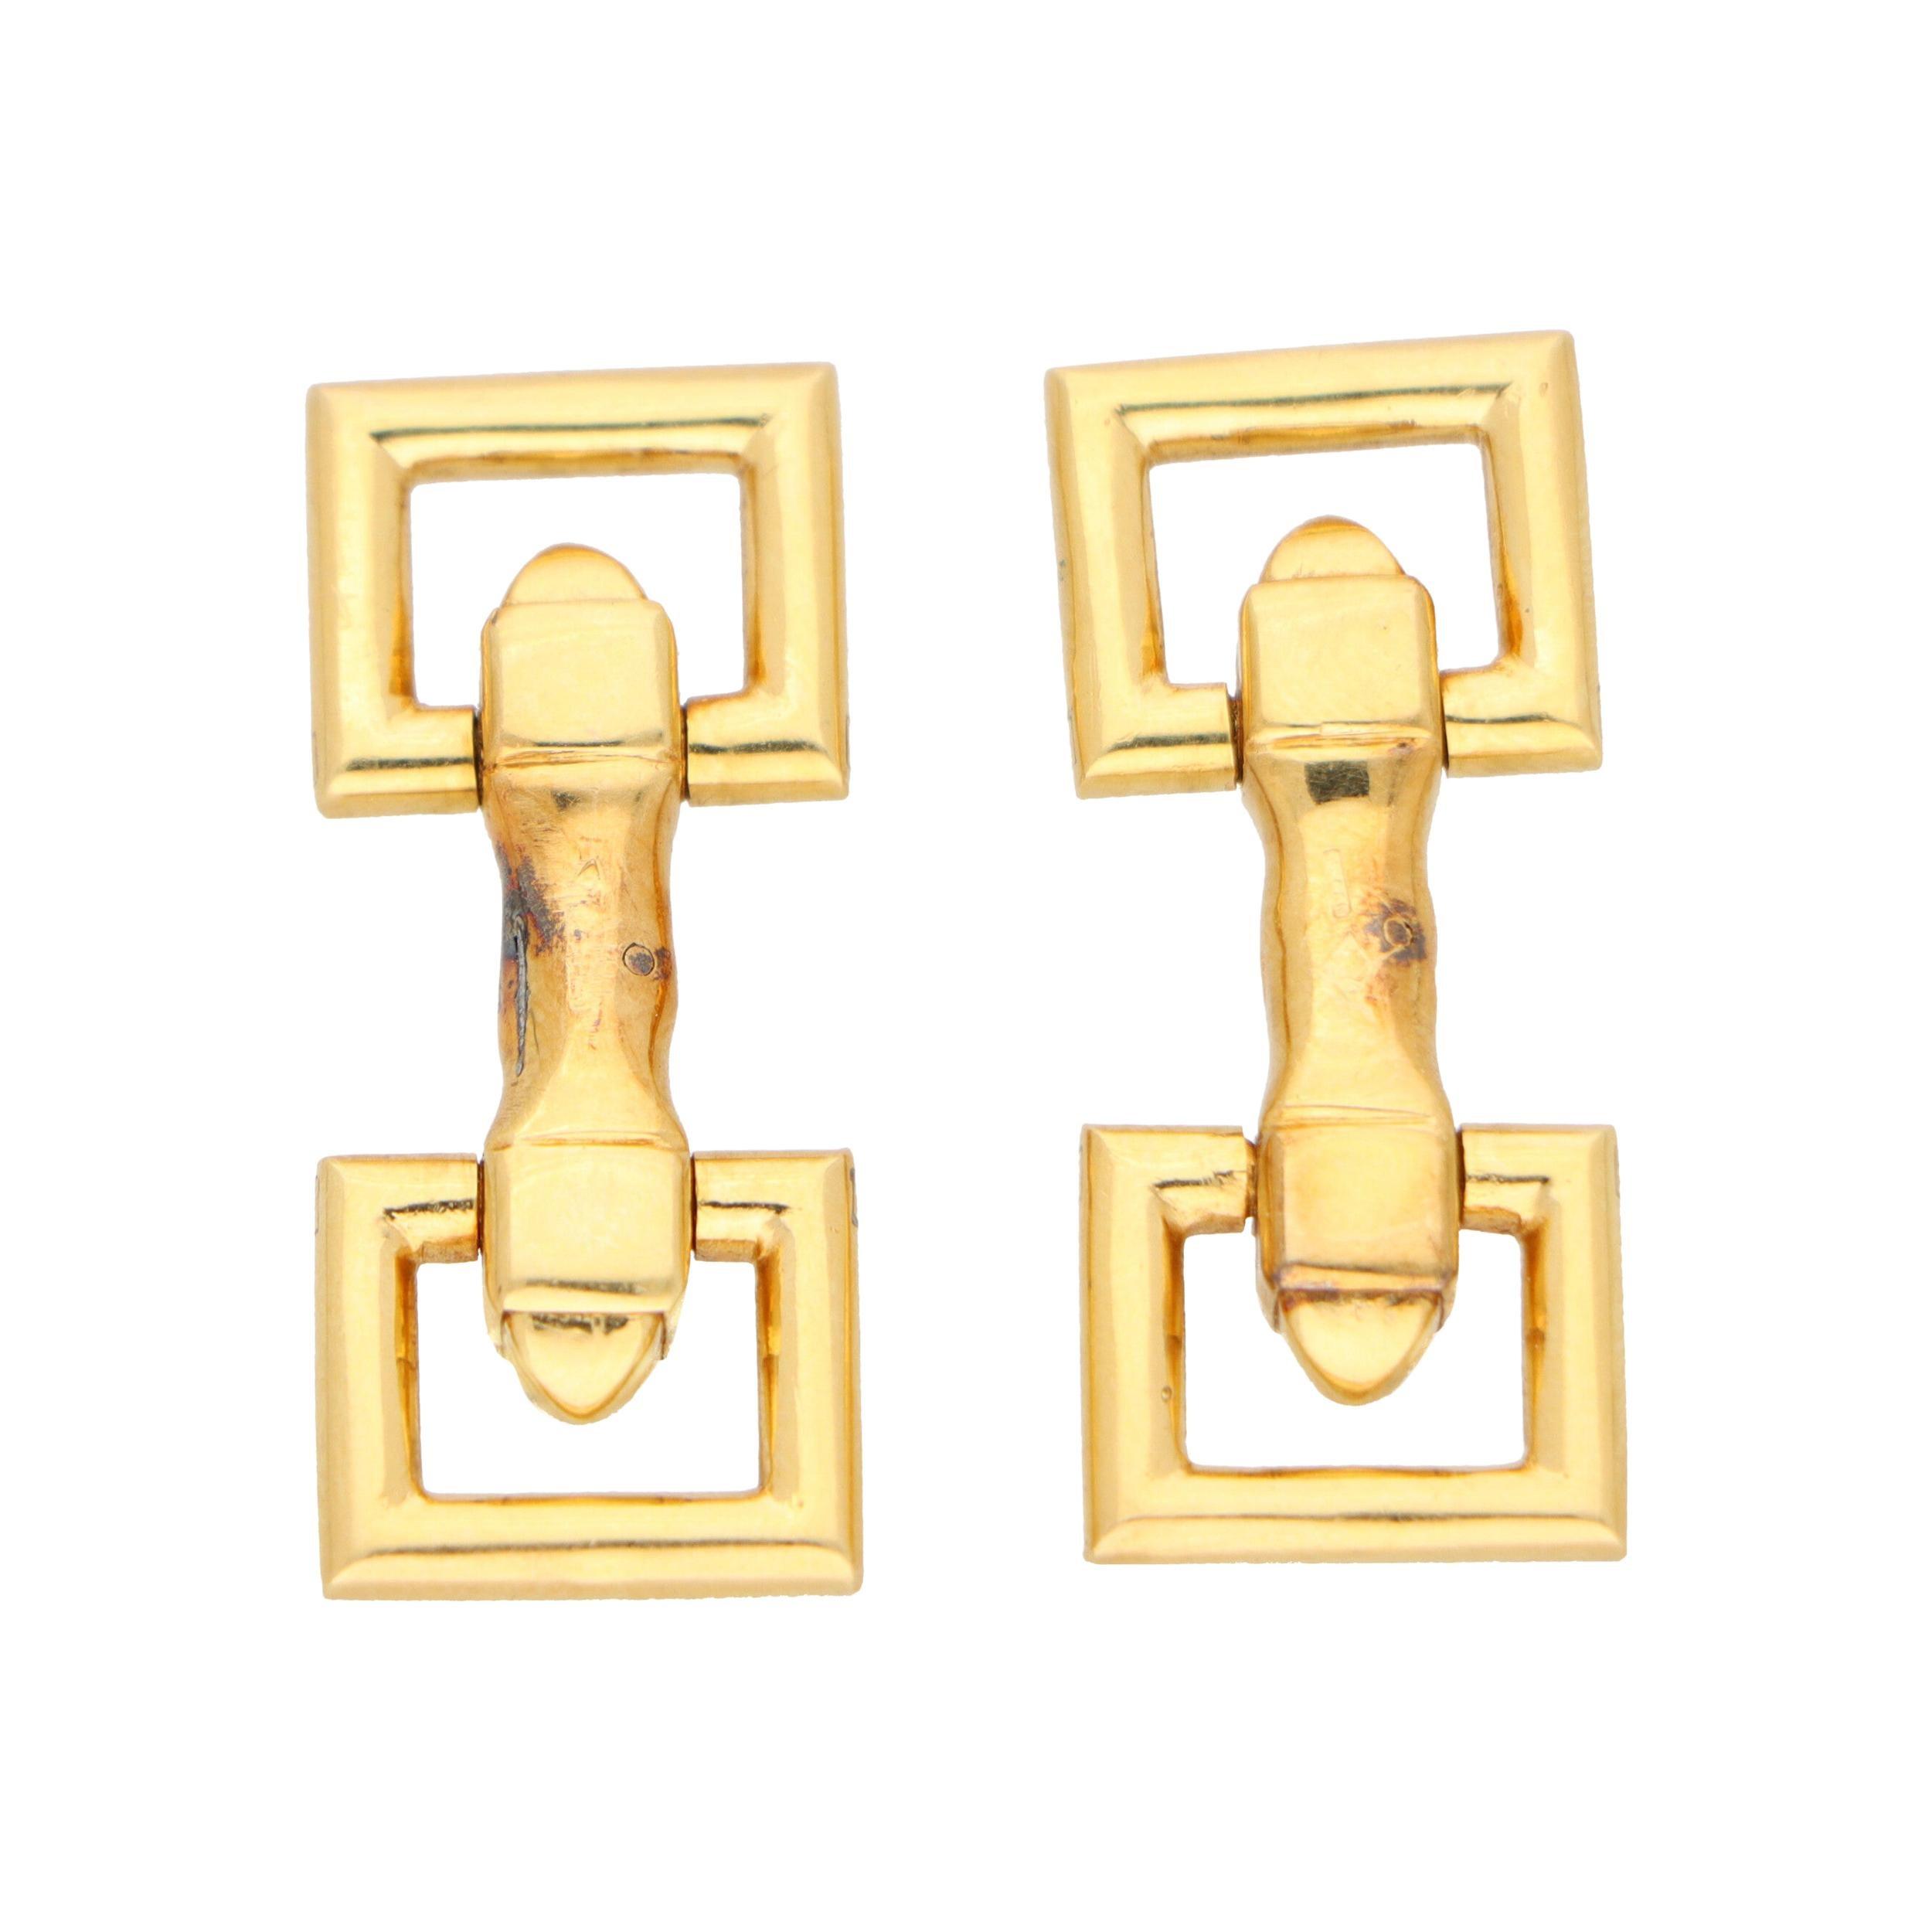 Vintage Cartier Paris Snaffle Bar Cufflinks in Solid 18k Yellow Gold